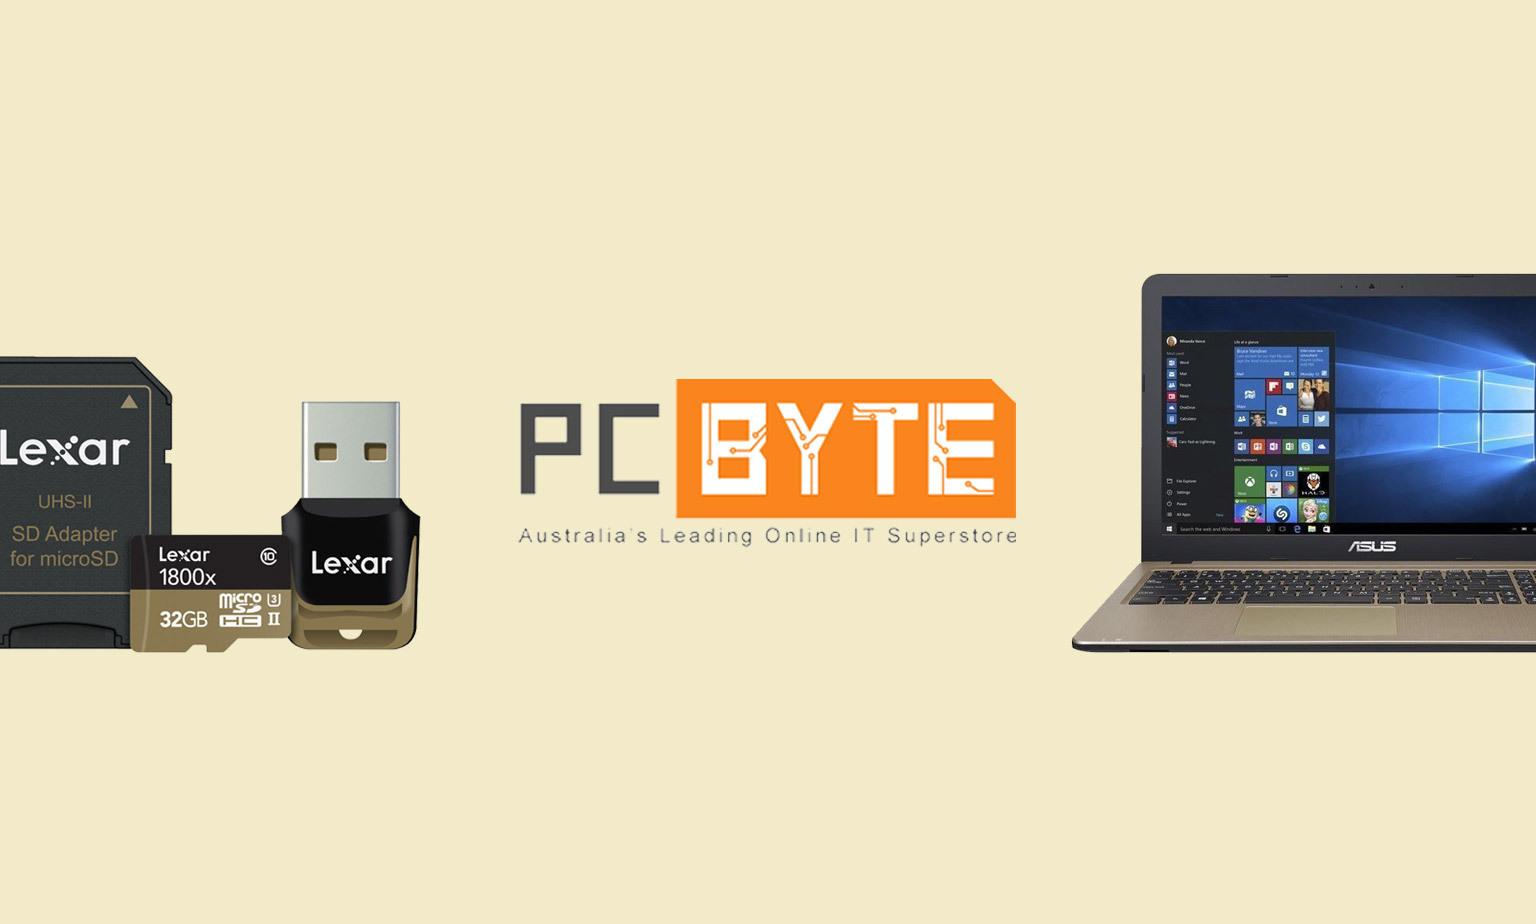 PC Byte Sales Event